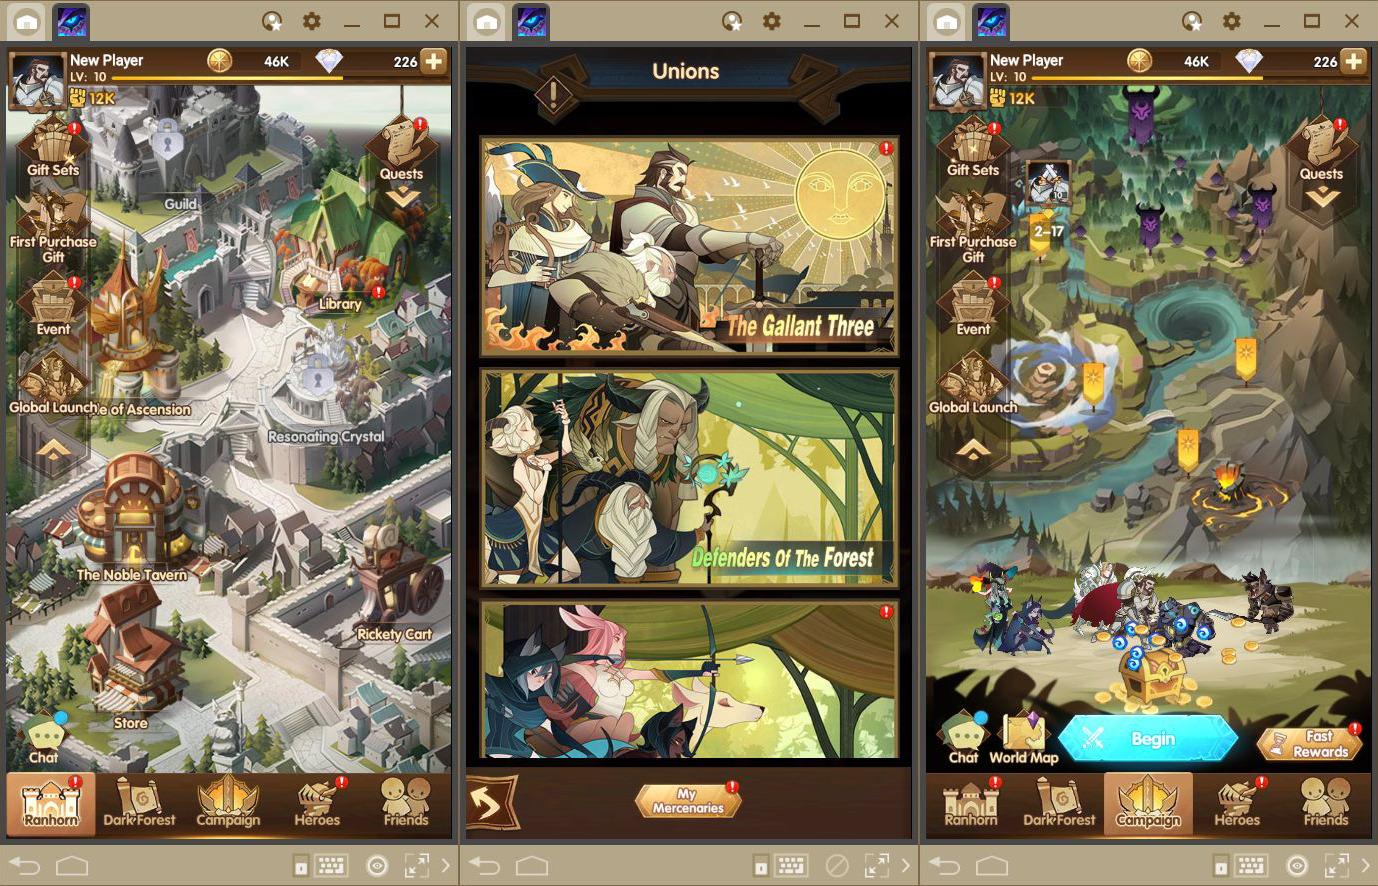 AFK 아레나 PC – 게임 초반에 사용하기 좋은 캐릭터 Top 5